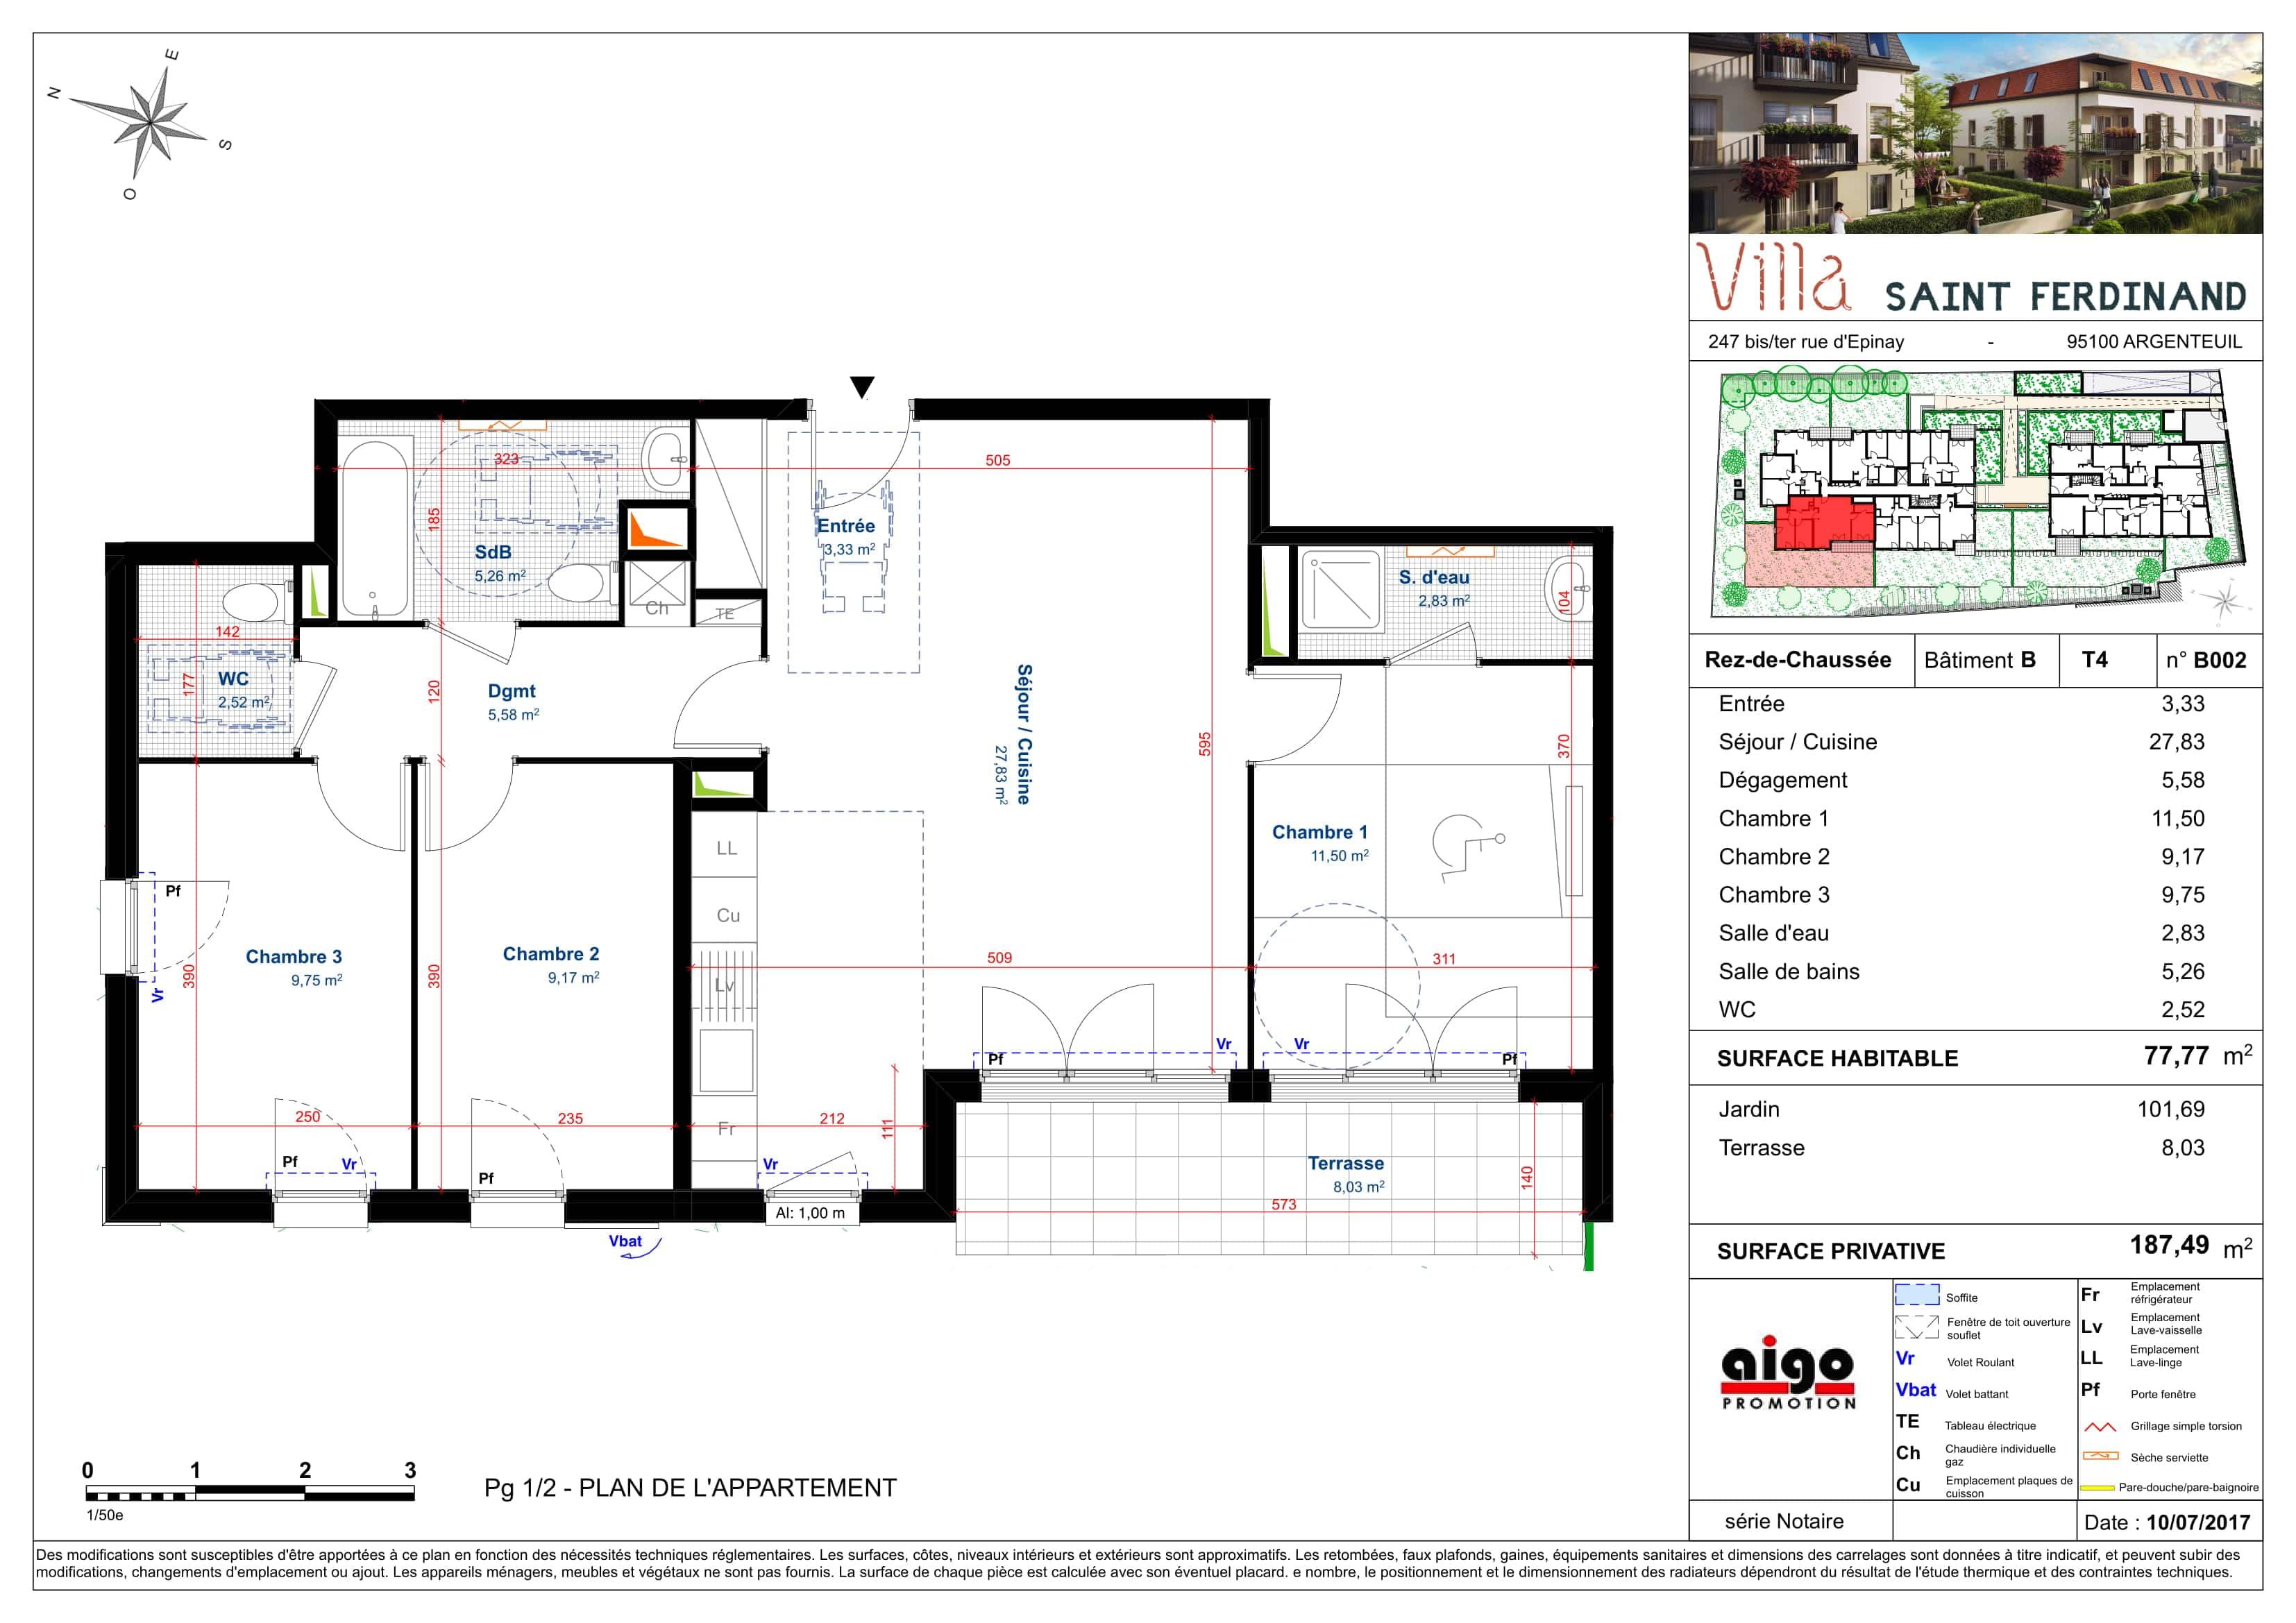 B002 : T4 programme immobilier argenteuil